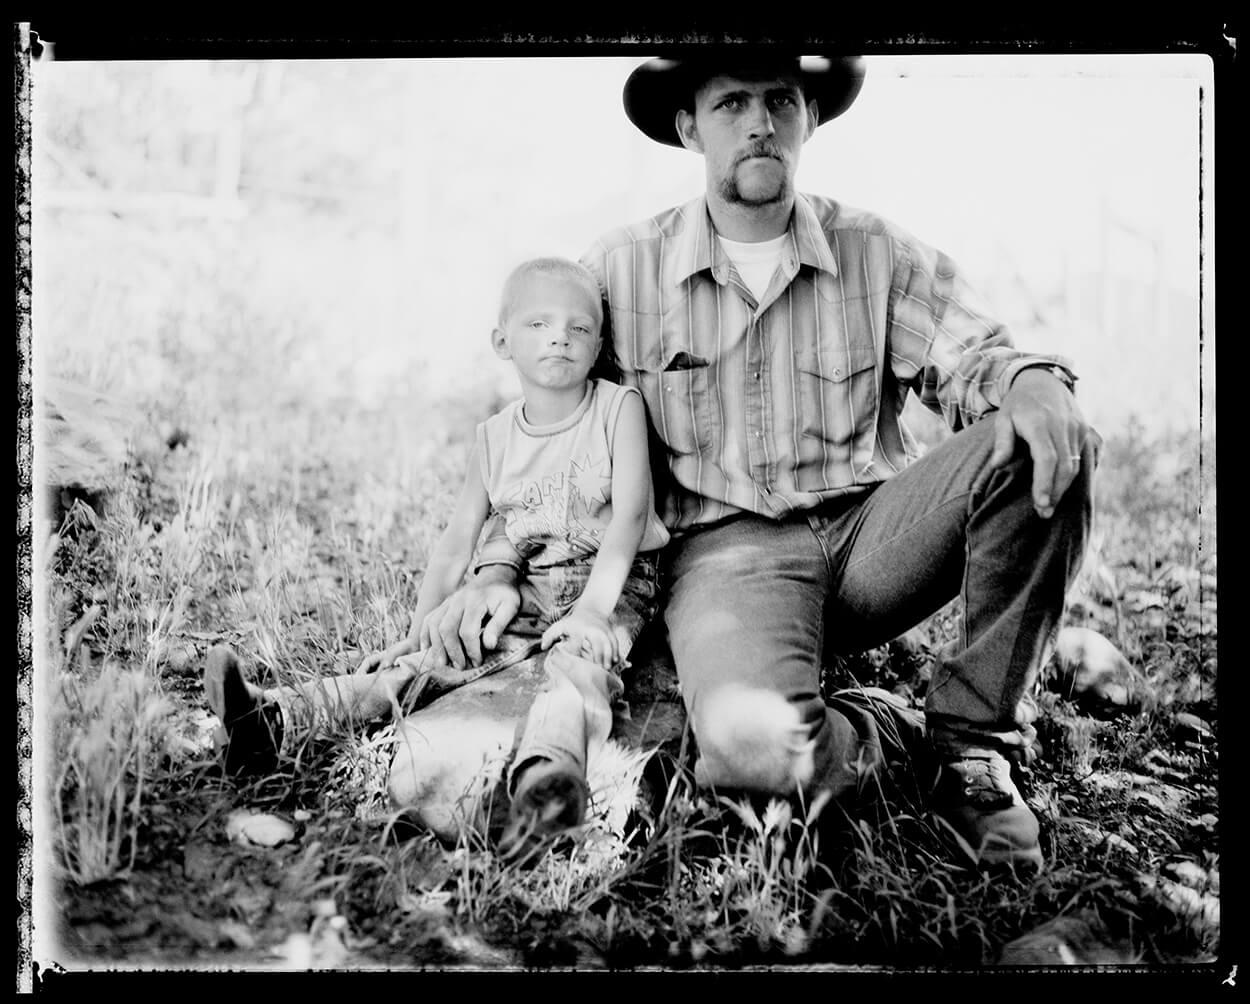 GEORGE & SON - Redneck Roundup - Hunter Barnes Photography